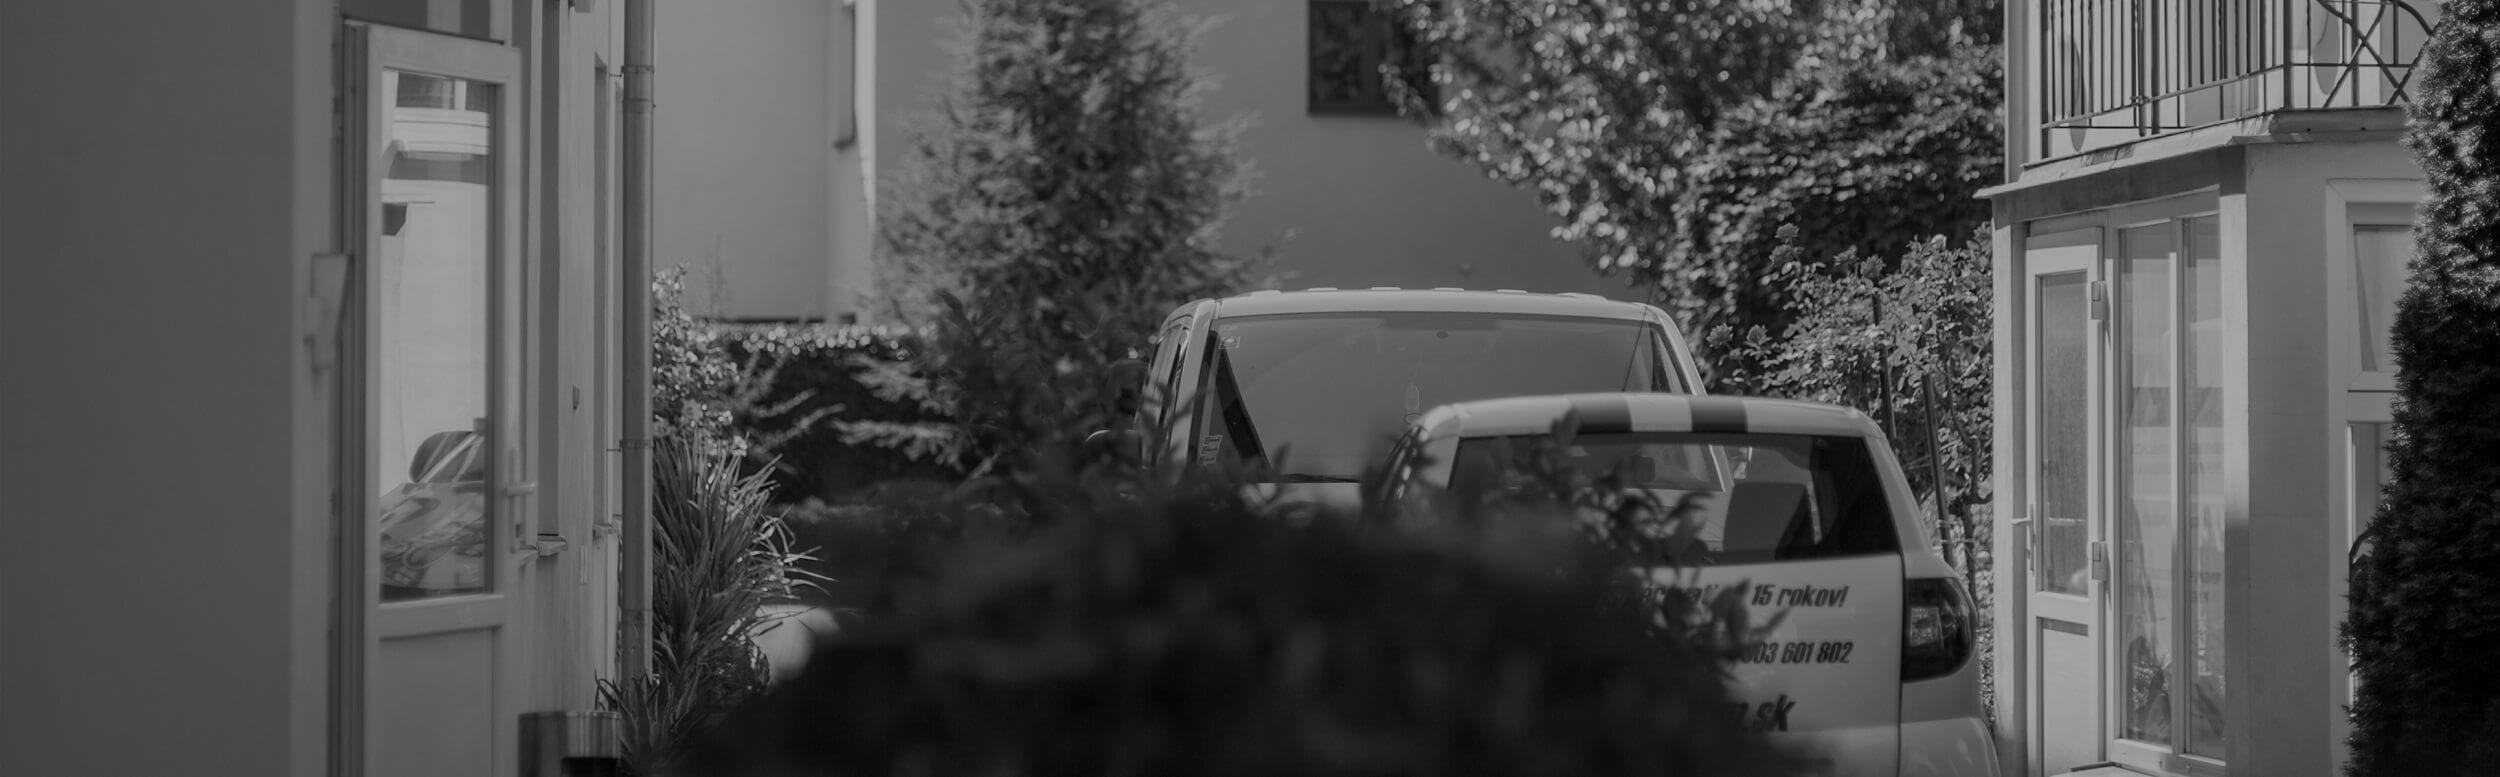 Backyard, trees, car